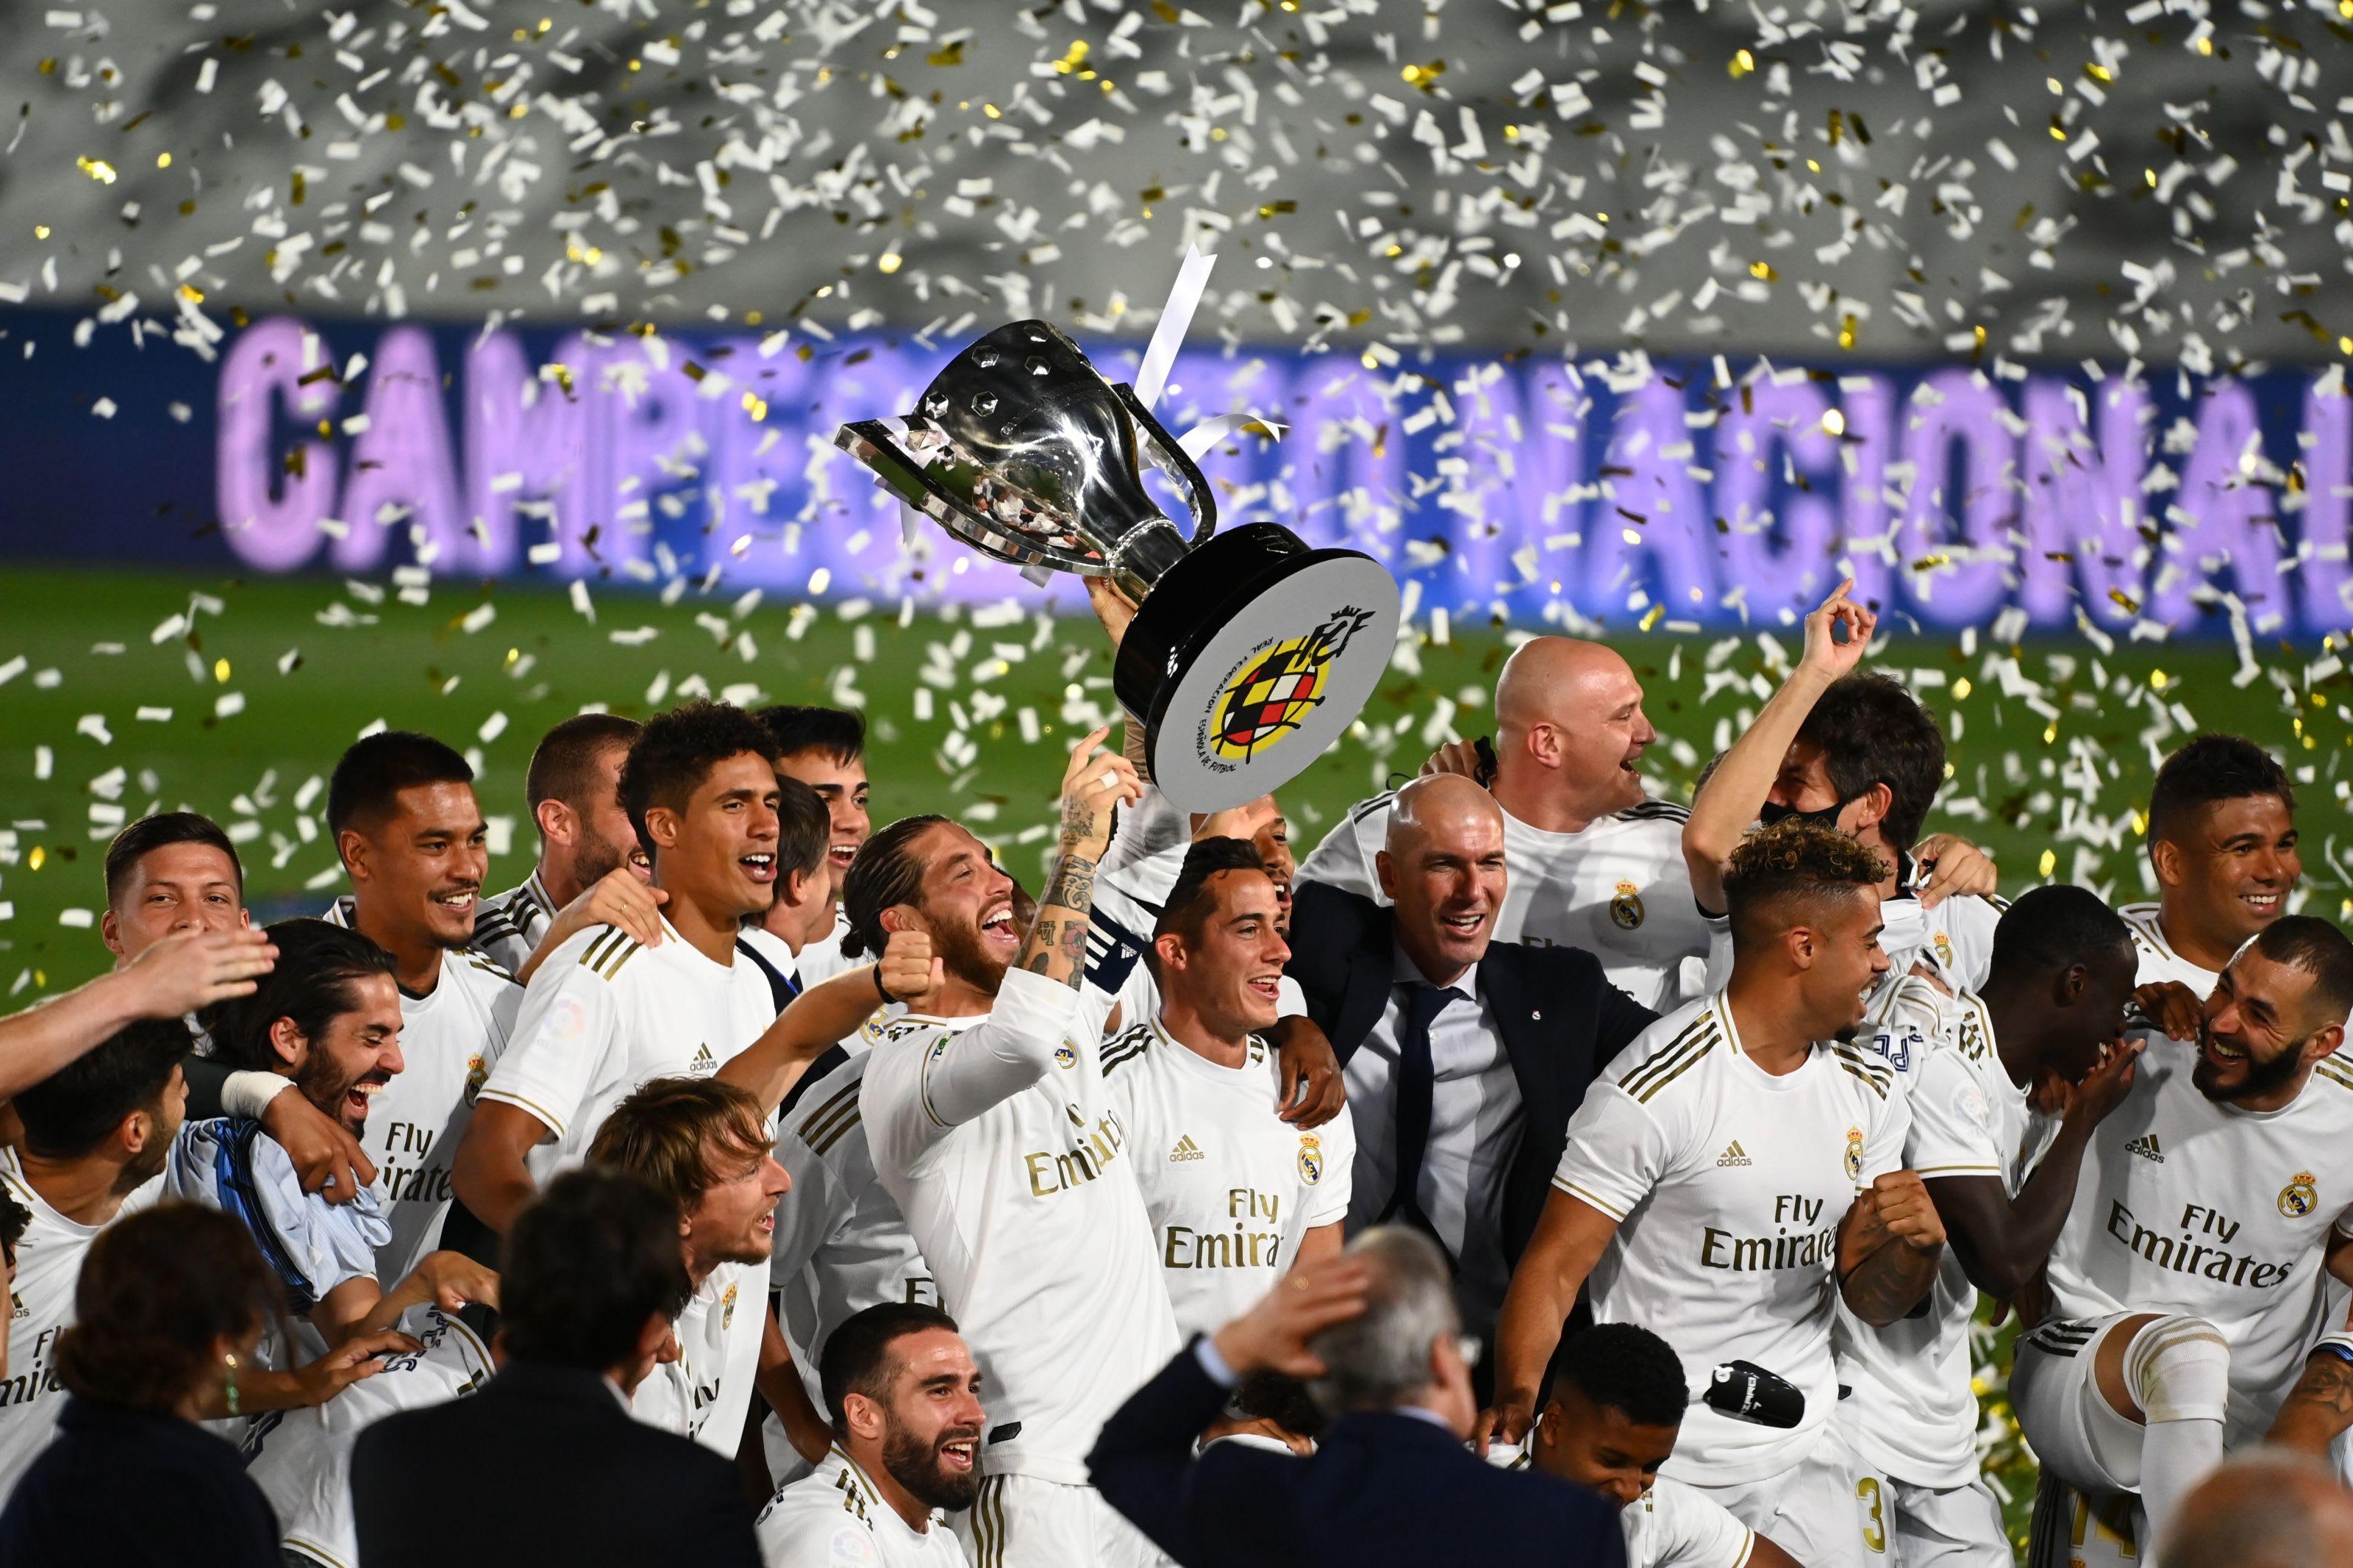 La Liga 2019/20: The Best Combined XI Of The Season